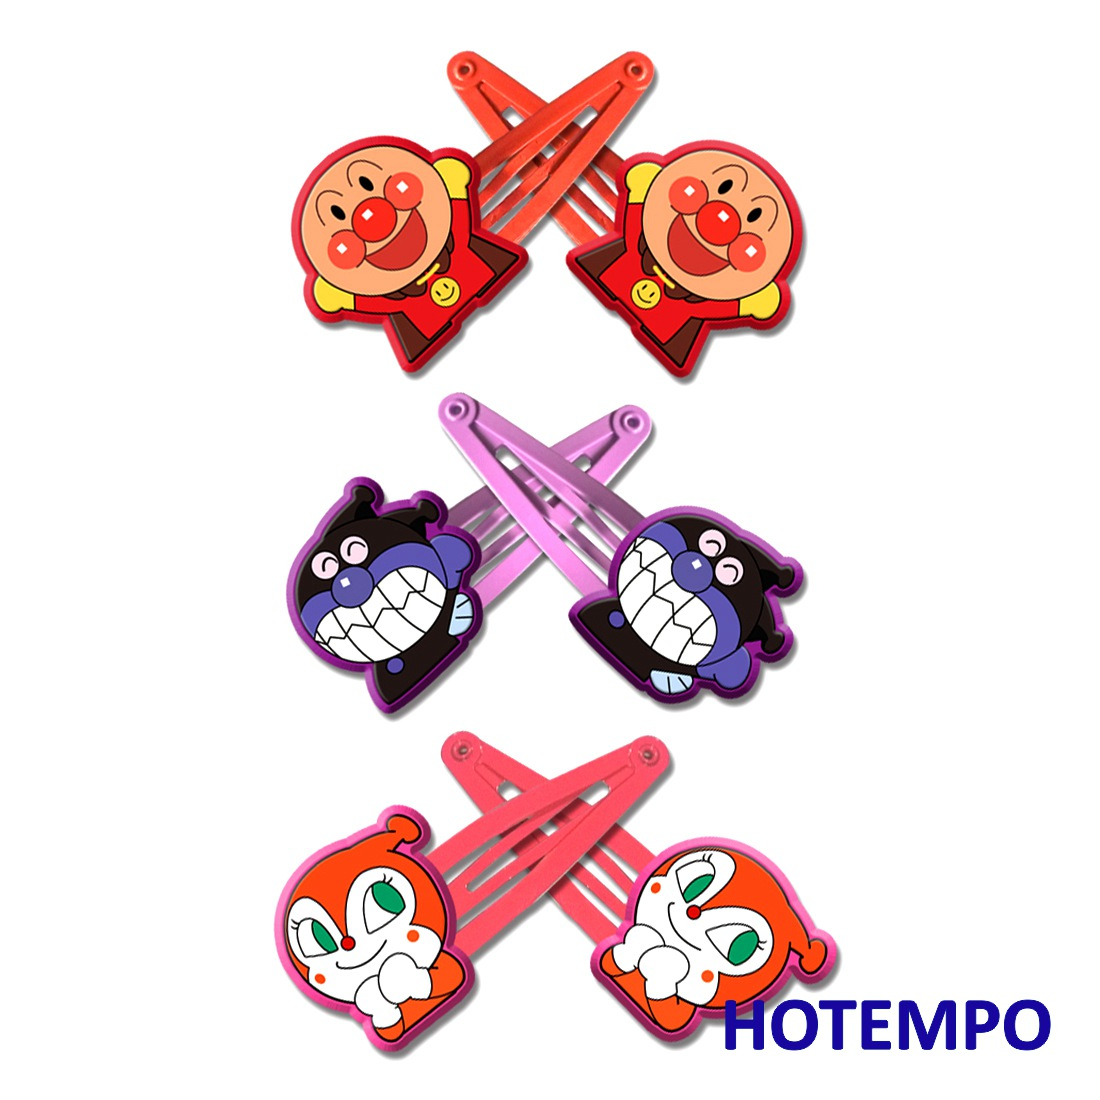 Japan Cute Cartoon Anpanman Dokin-chan Baikinman Kawaii Hair Accessories Hairpins For Baby Girls Children Kids Gift